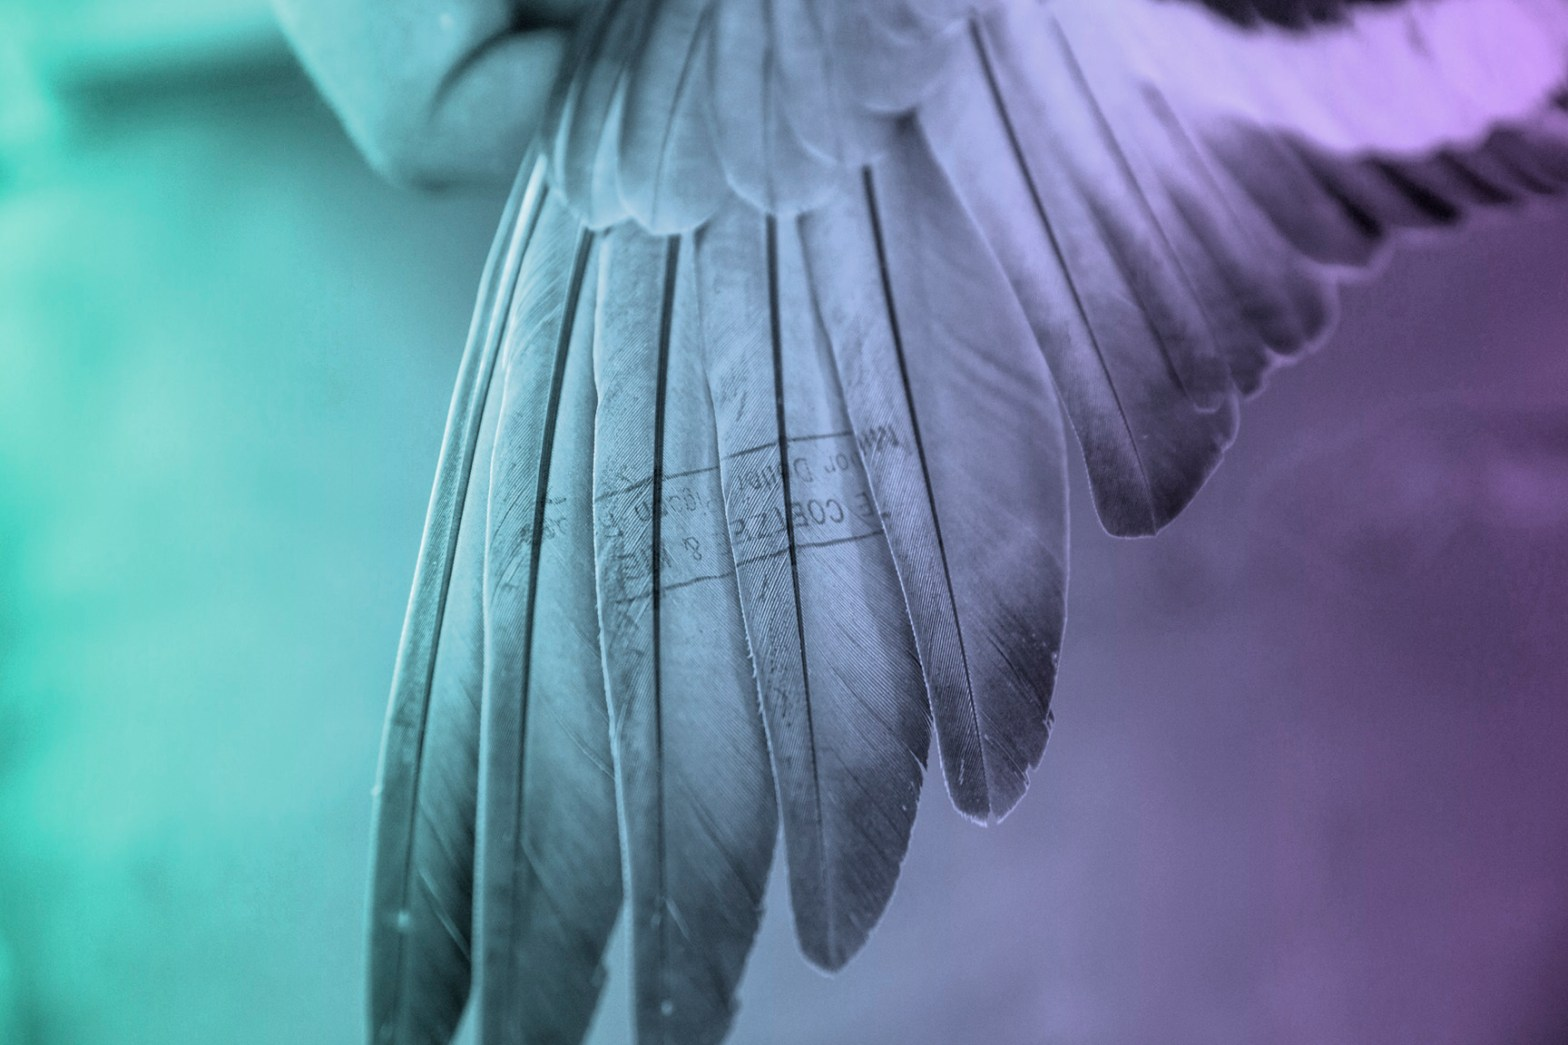 pigeonphoto-1438355275-36.jpg